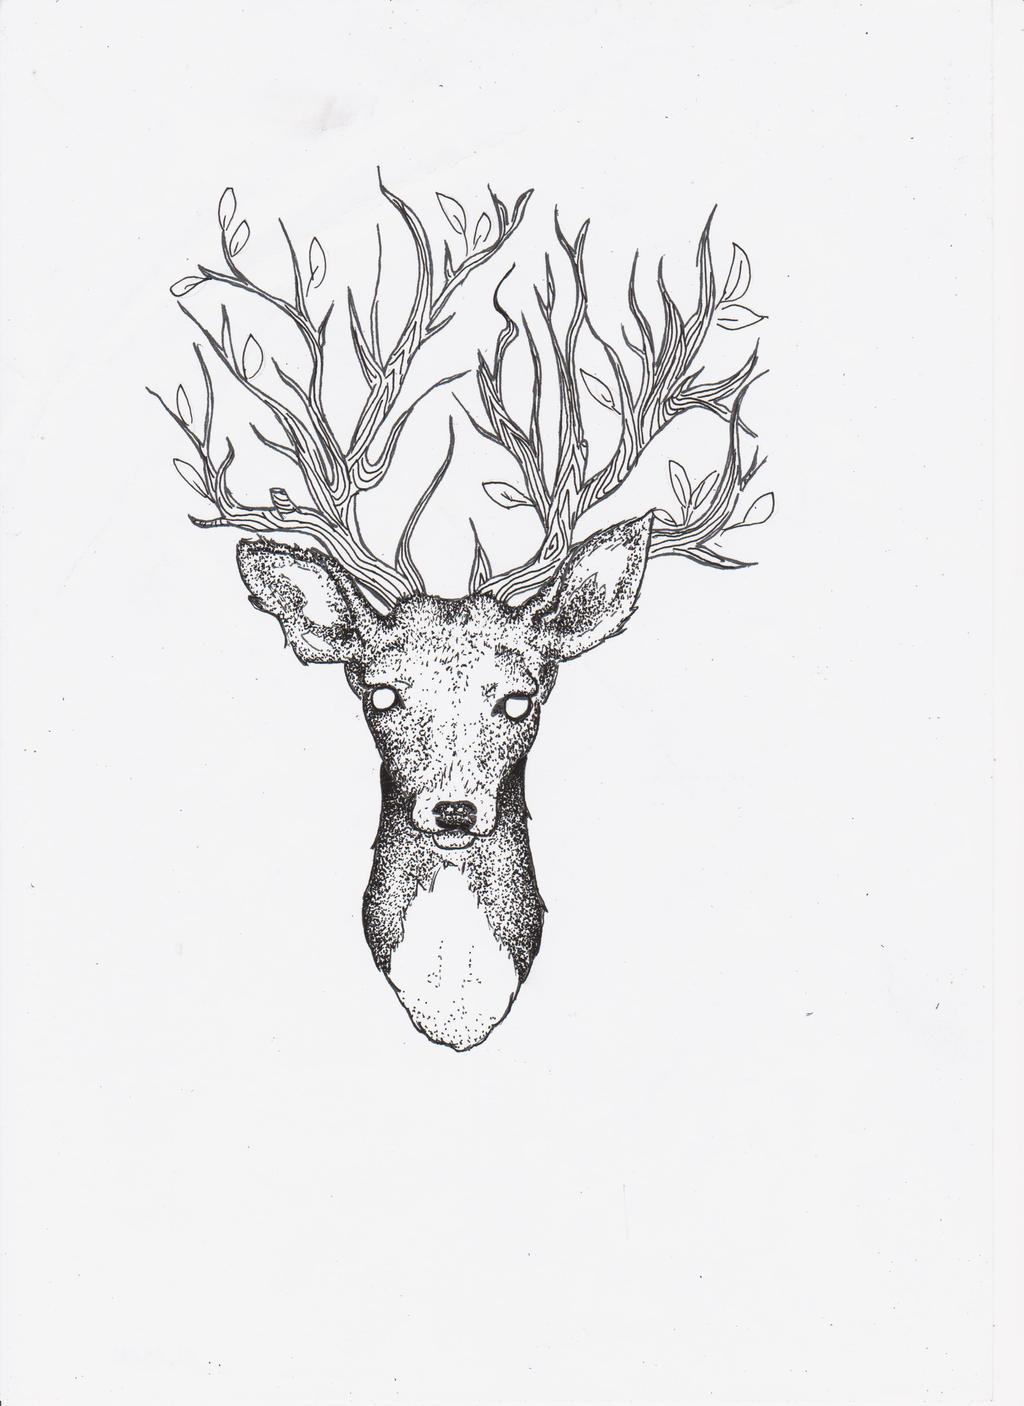 Ink deer by sempeternally on deviantart for Line drawing wallpaper